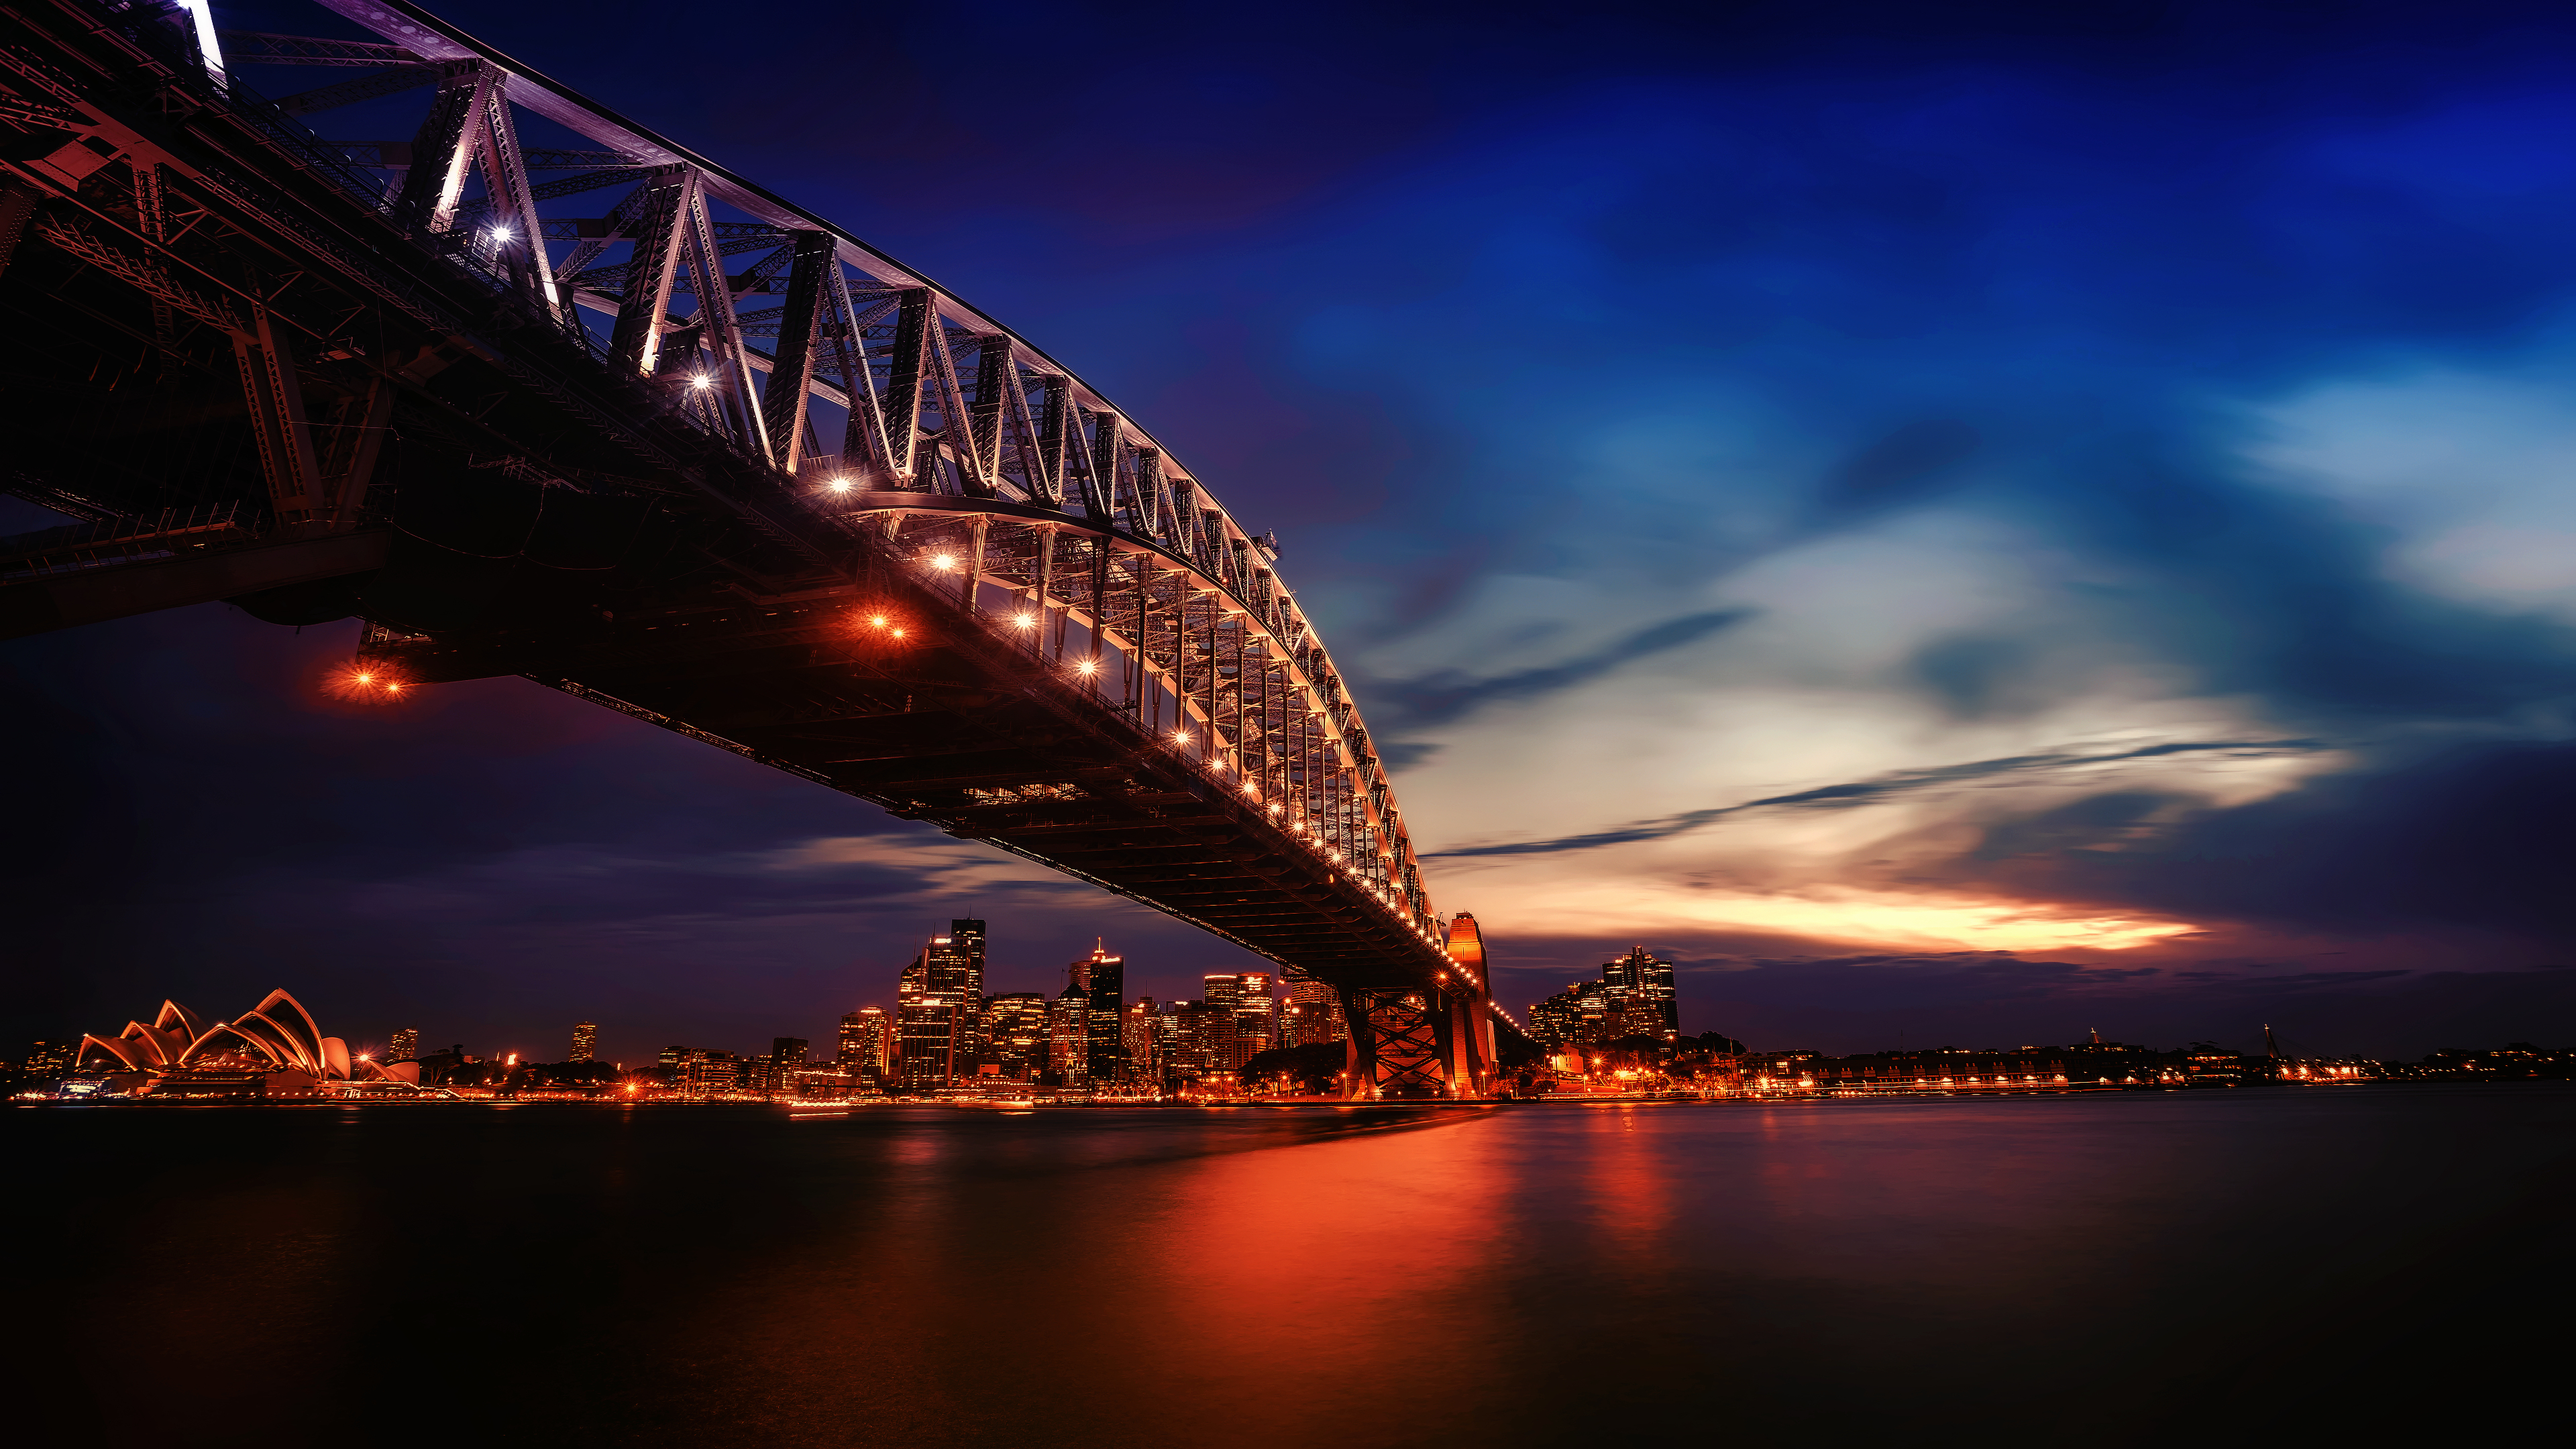 General 3840x2160 cityscape city sunlight sunset landscape photography architecture water city lights clouds bridge Sydney Sydney Harbour sea